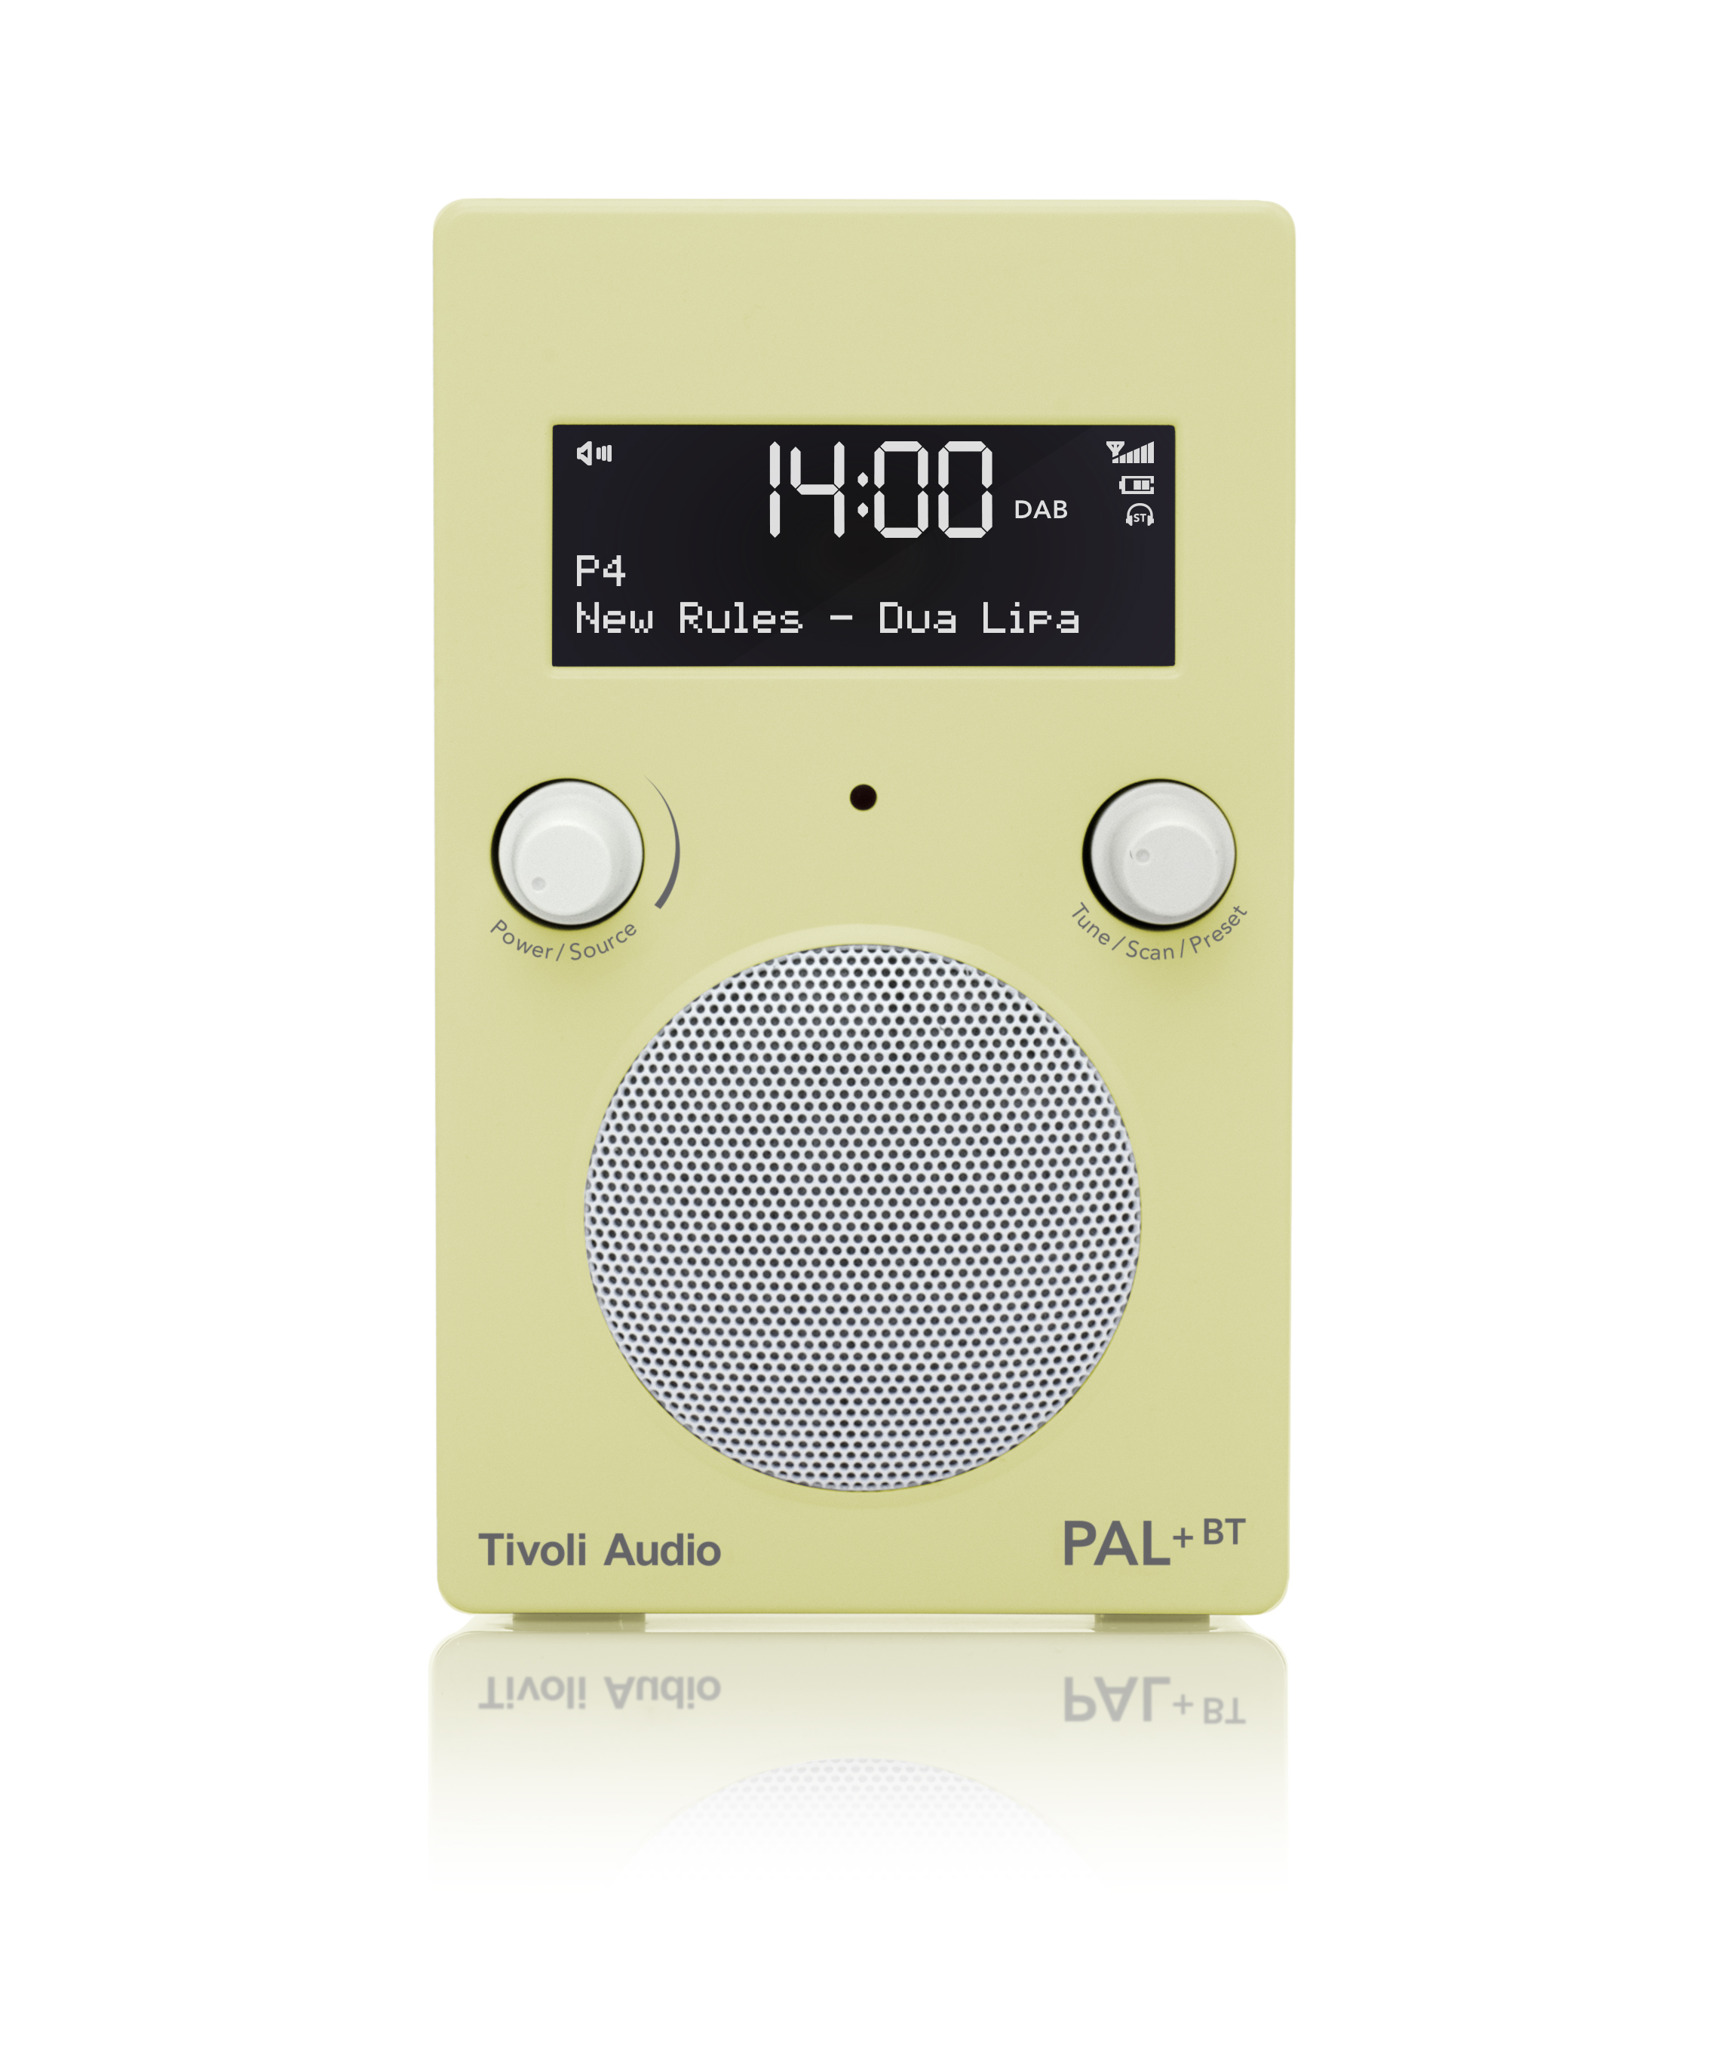 Hypermoderne Frische Frühlingsfarben zaubern gute Laune: Tivoli Audio stellt EH-68